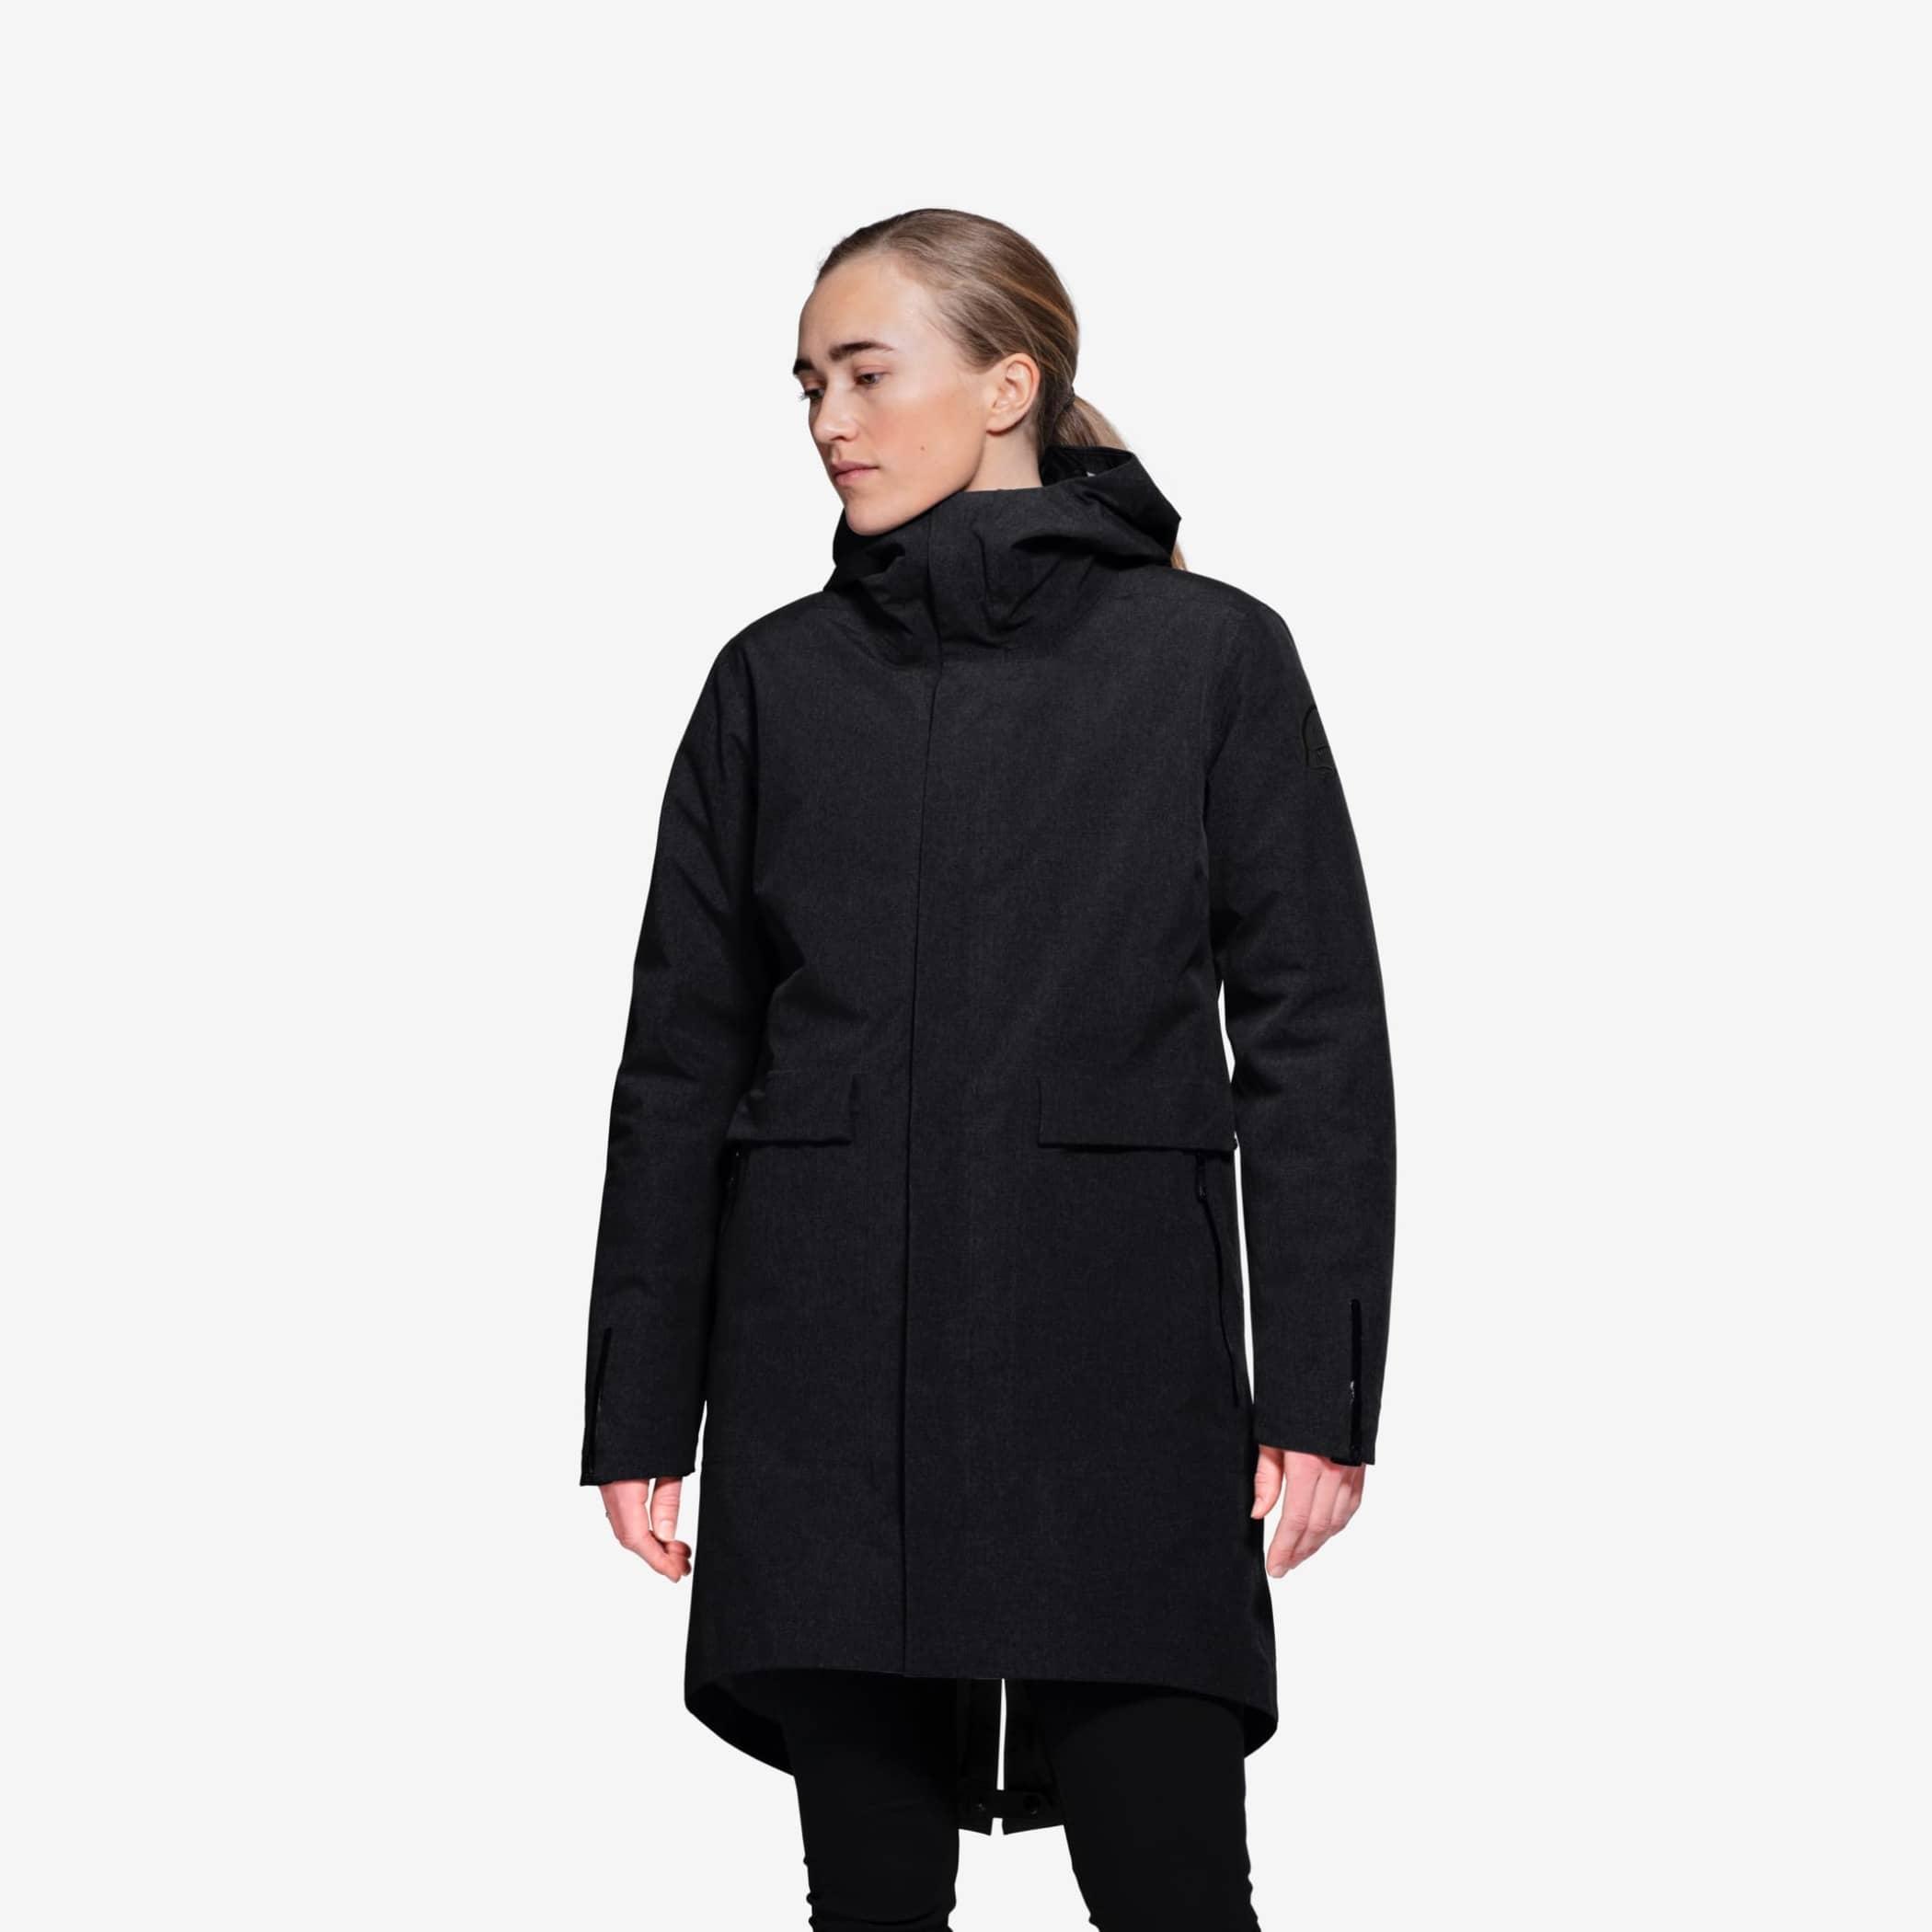 Fur, Sleeve, Parka, Jacket, Coat, Hood, Outerwear, Clothing